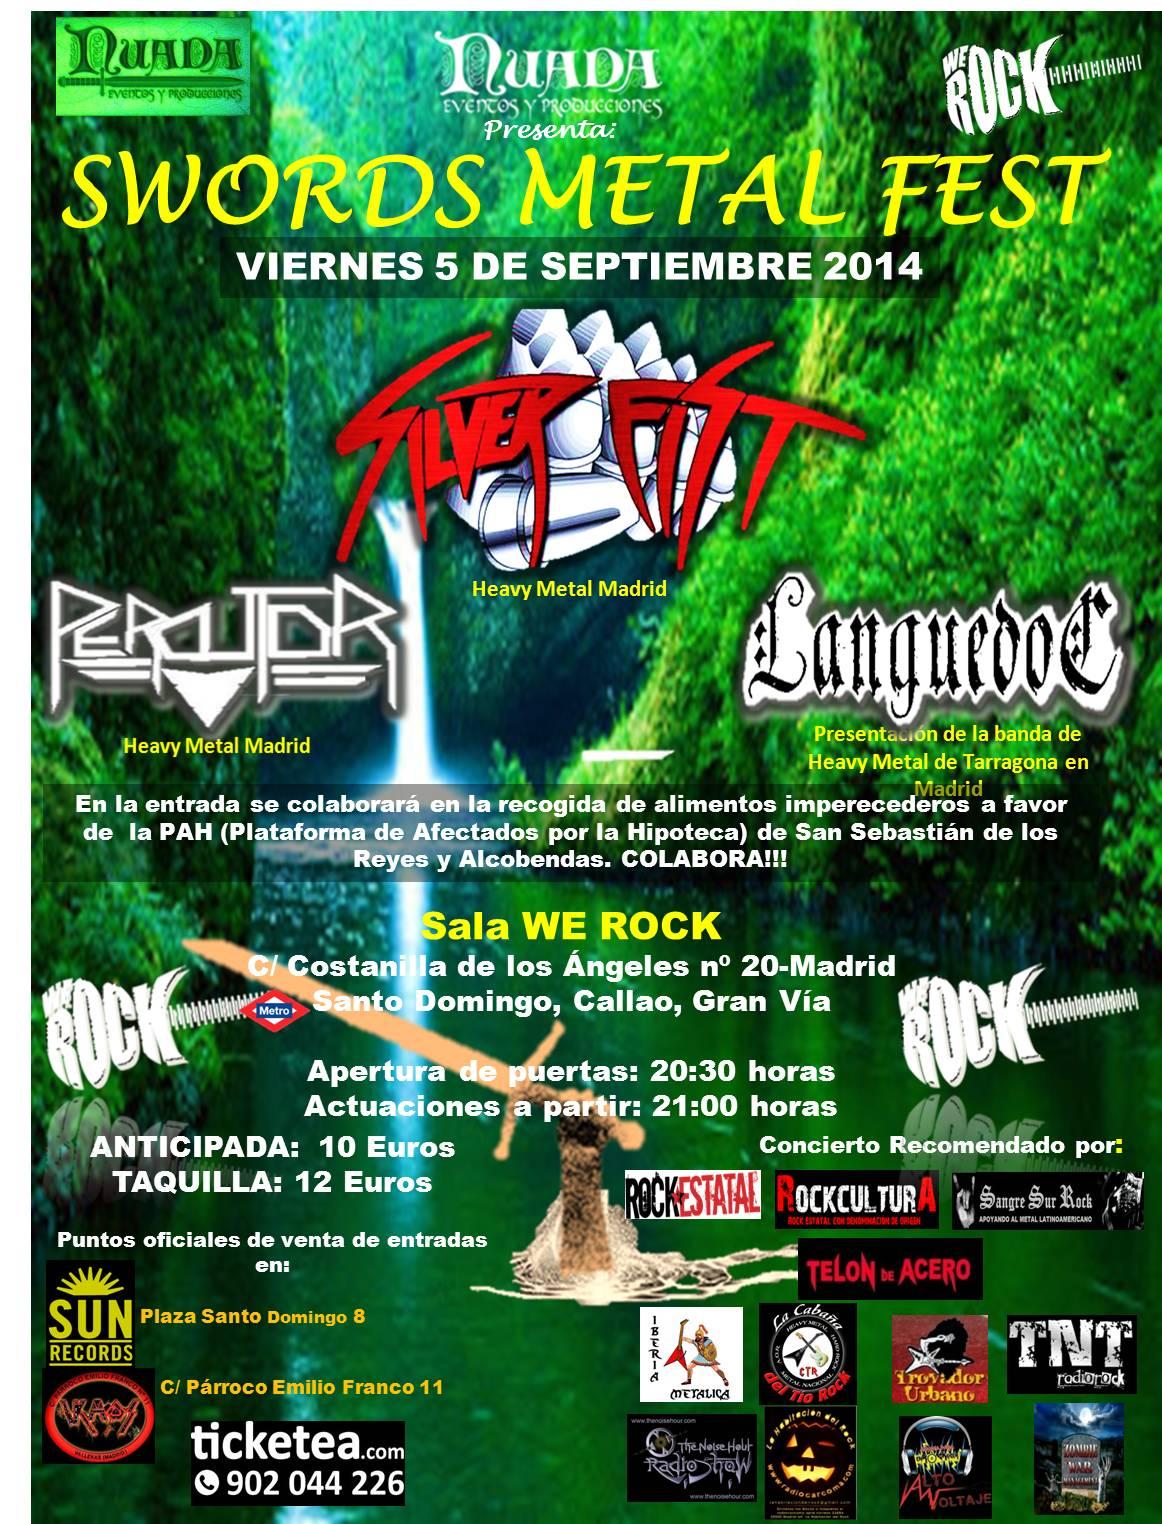 cartel definitivo sword metal fest